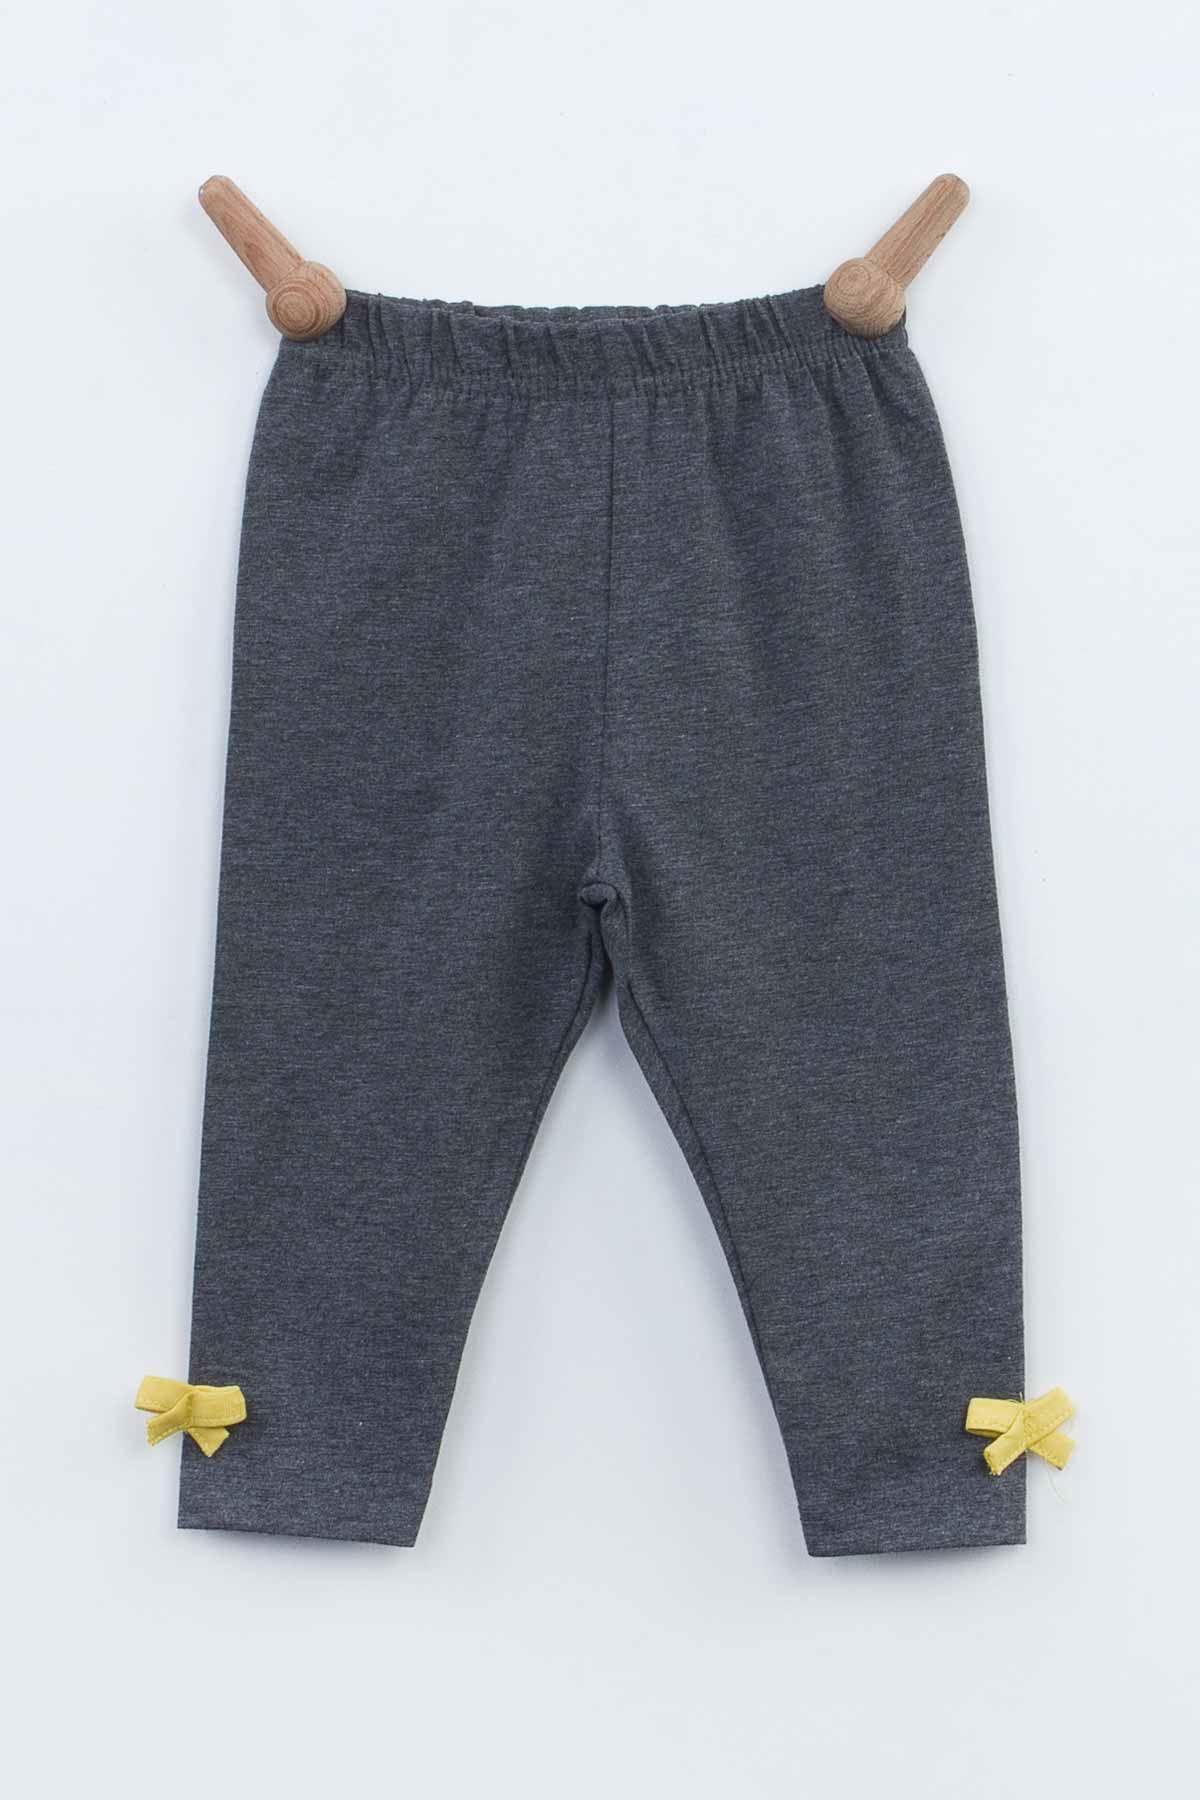 Yellow Grey Baby Girl 3-piece Suit Set Top Badi Bottom Clothing Top Outfit Babies Cotton Body Seasonal Spring baby Models